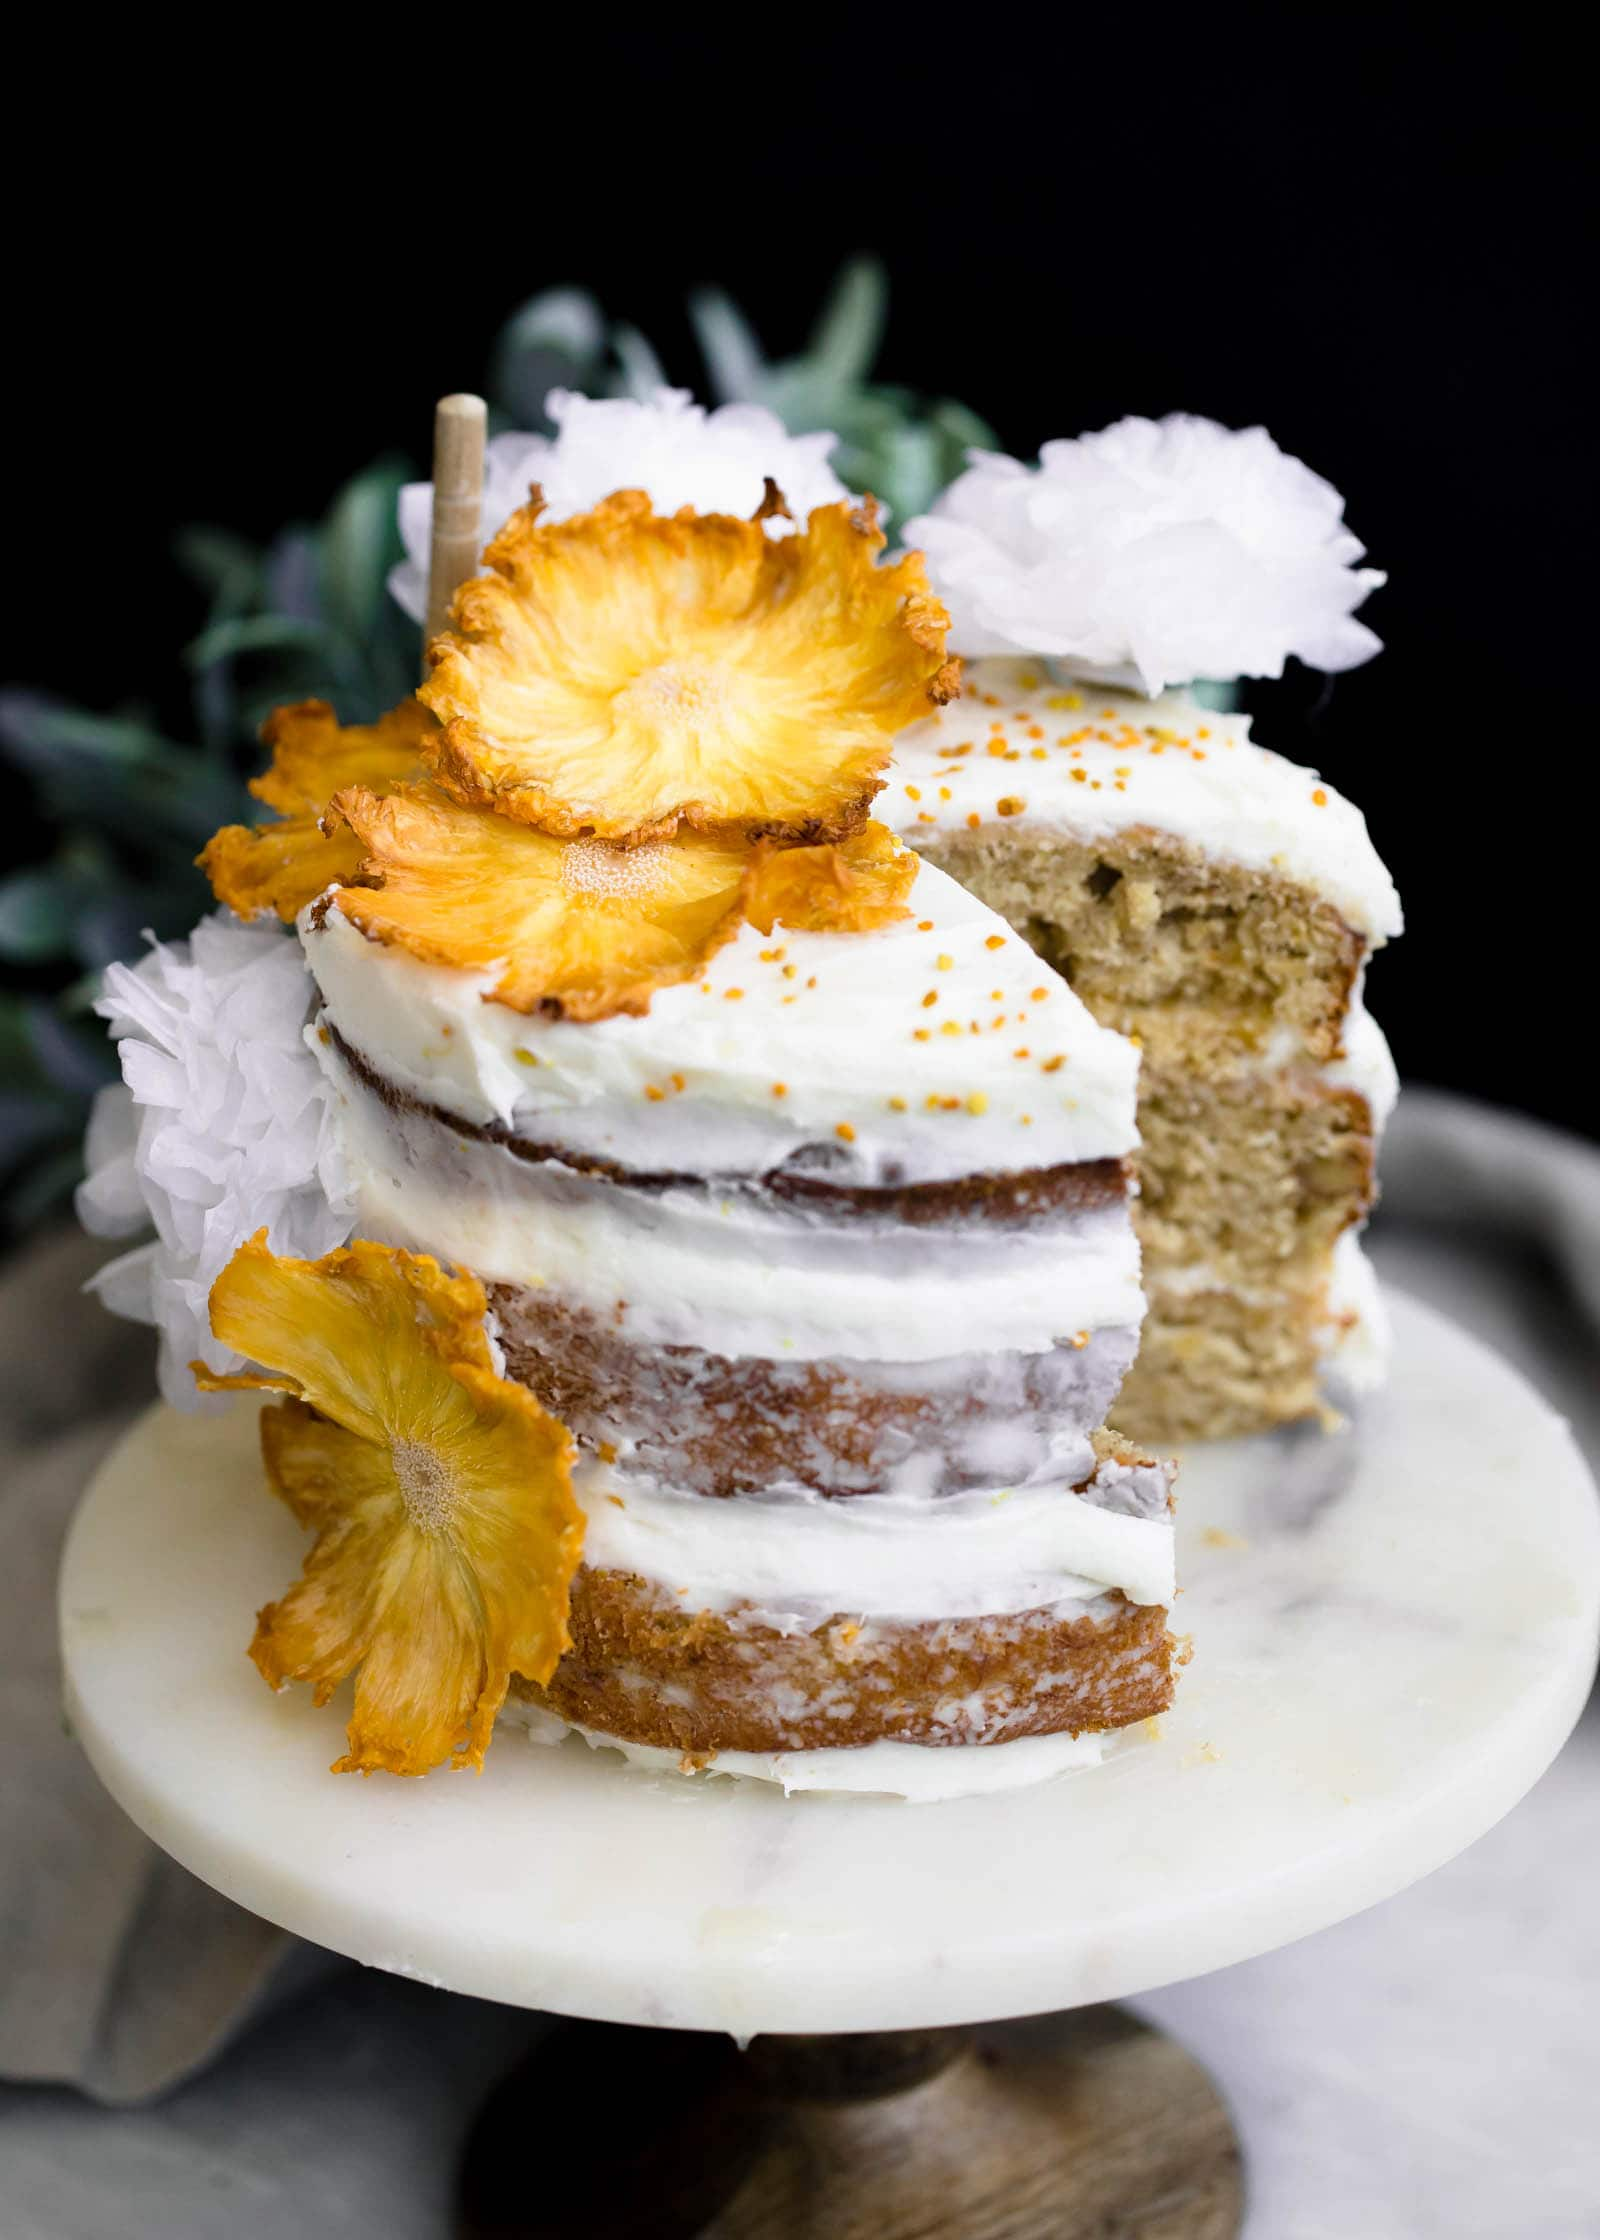 sliced Hummingbird Cake on cake stand